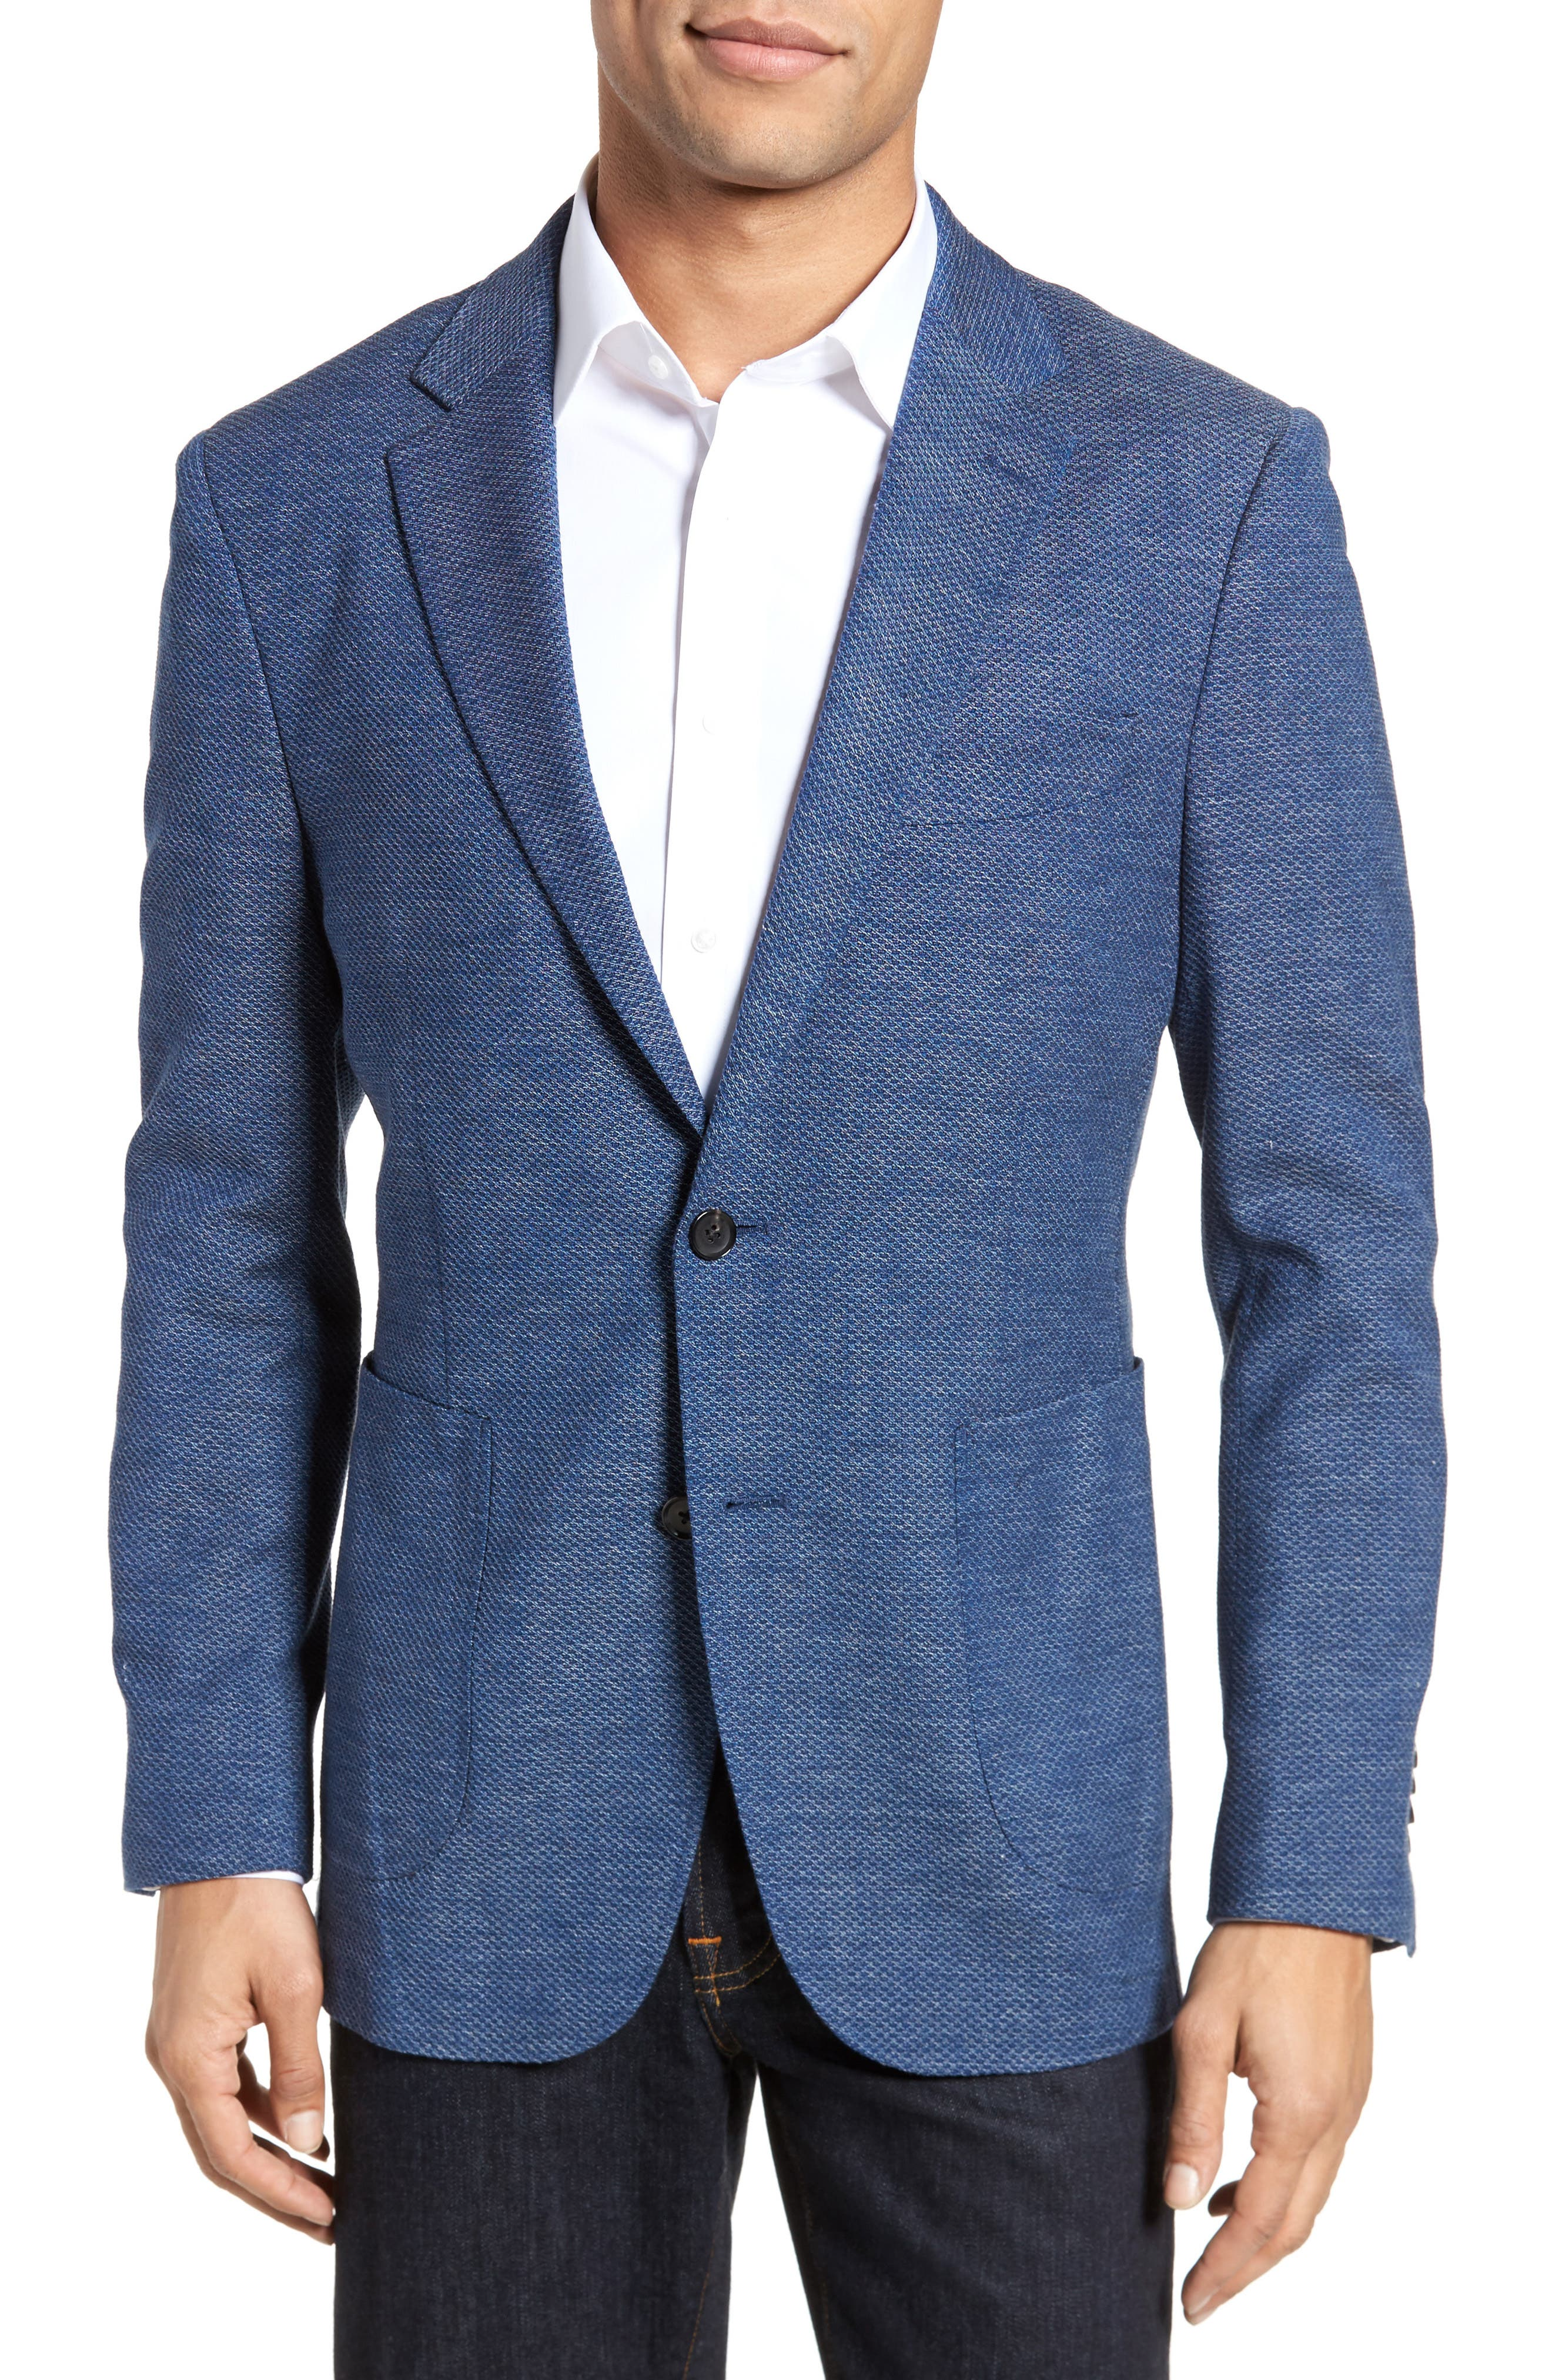 Fife Street Wool Blend Blazer,                         Main,                         color, Marine